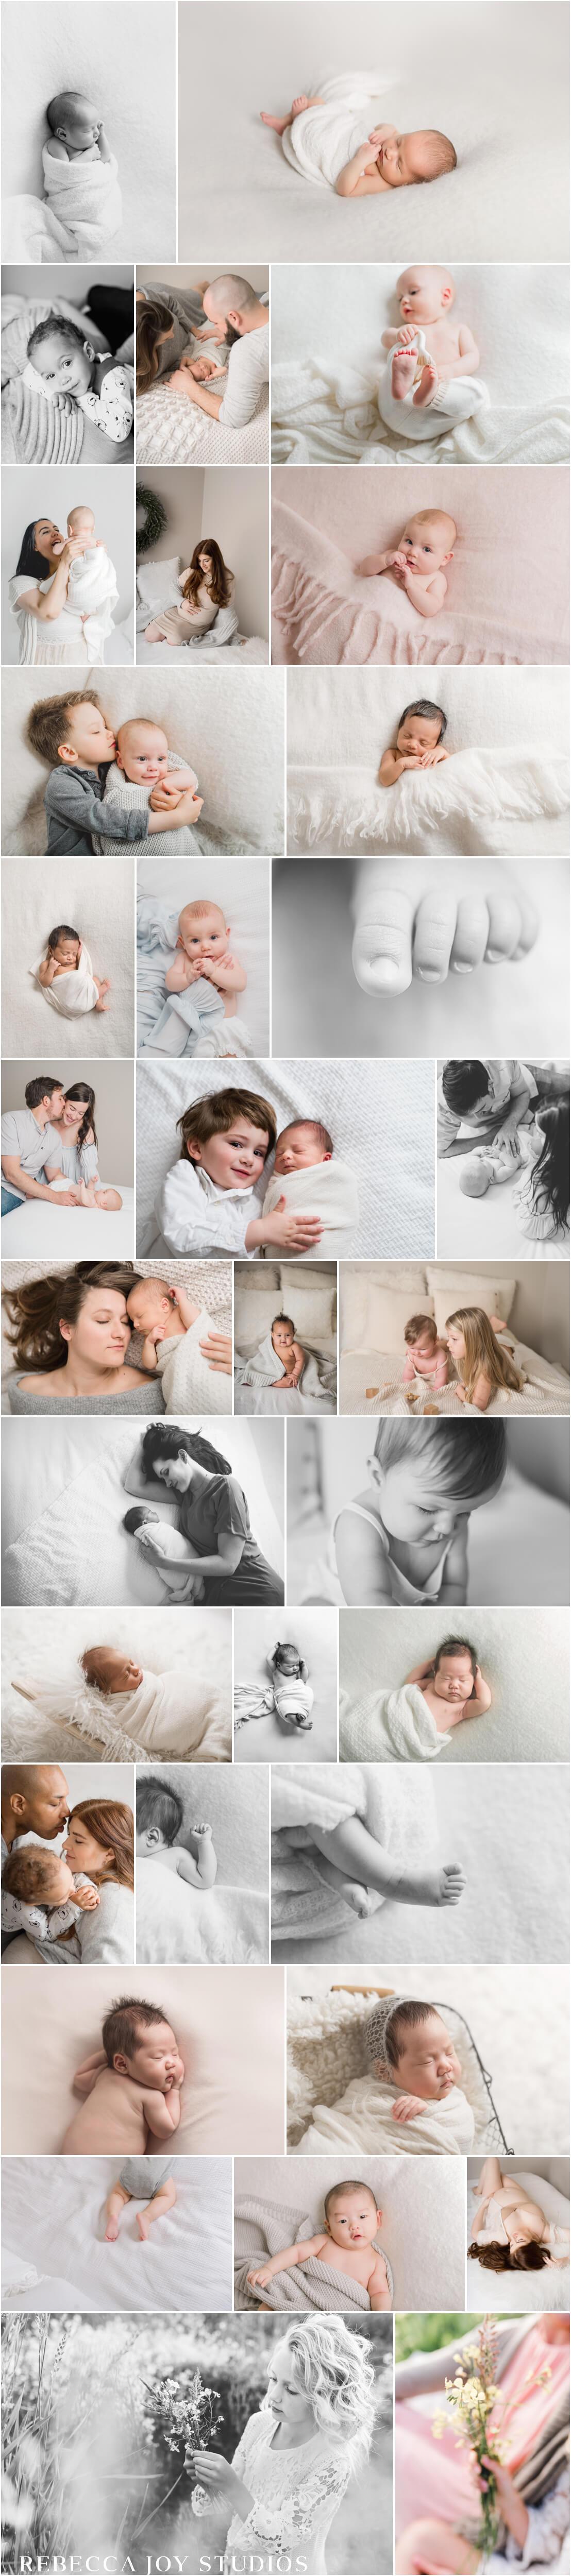 Newborn Photographers Victoria